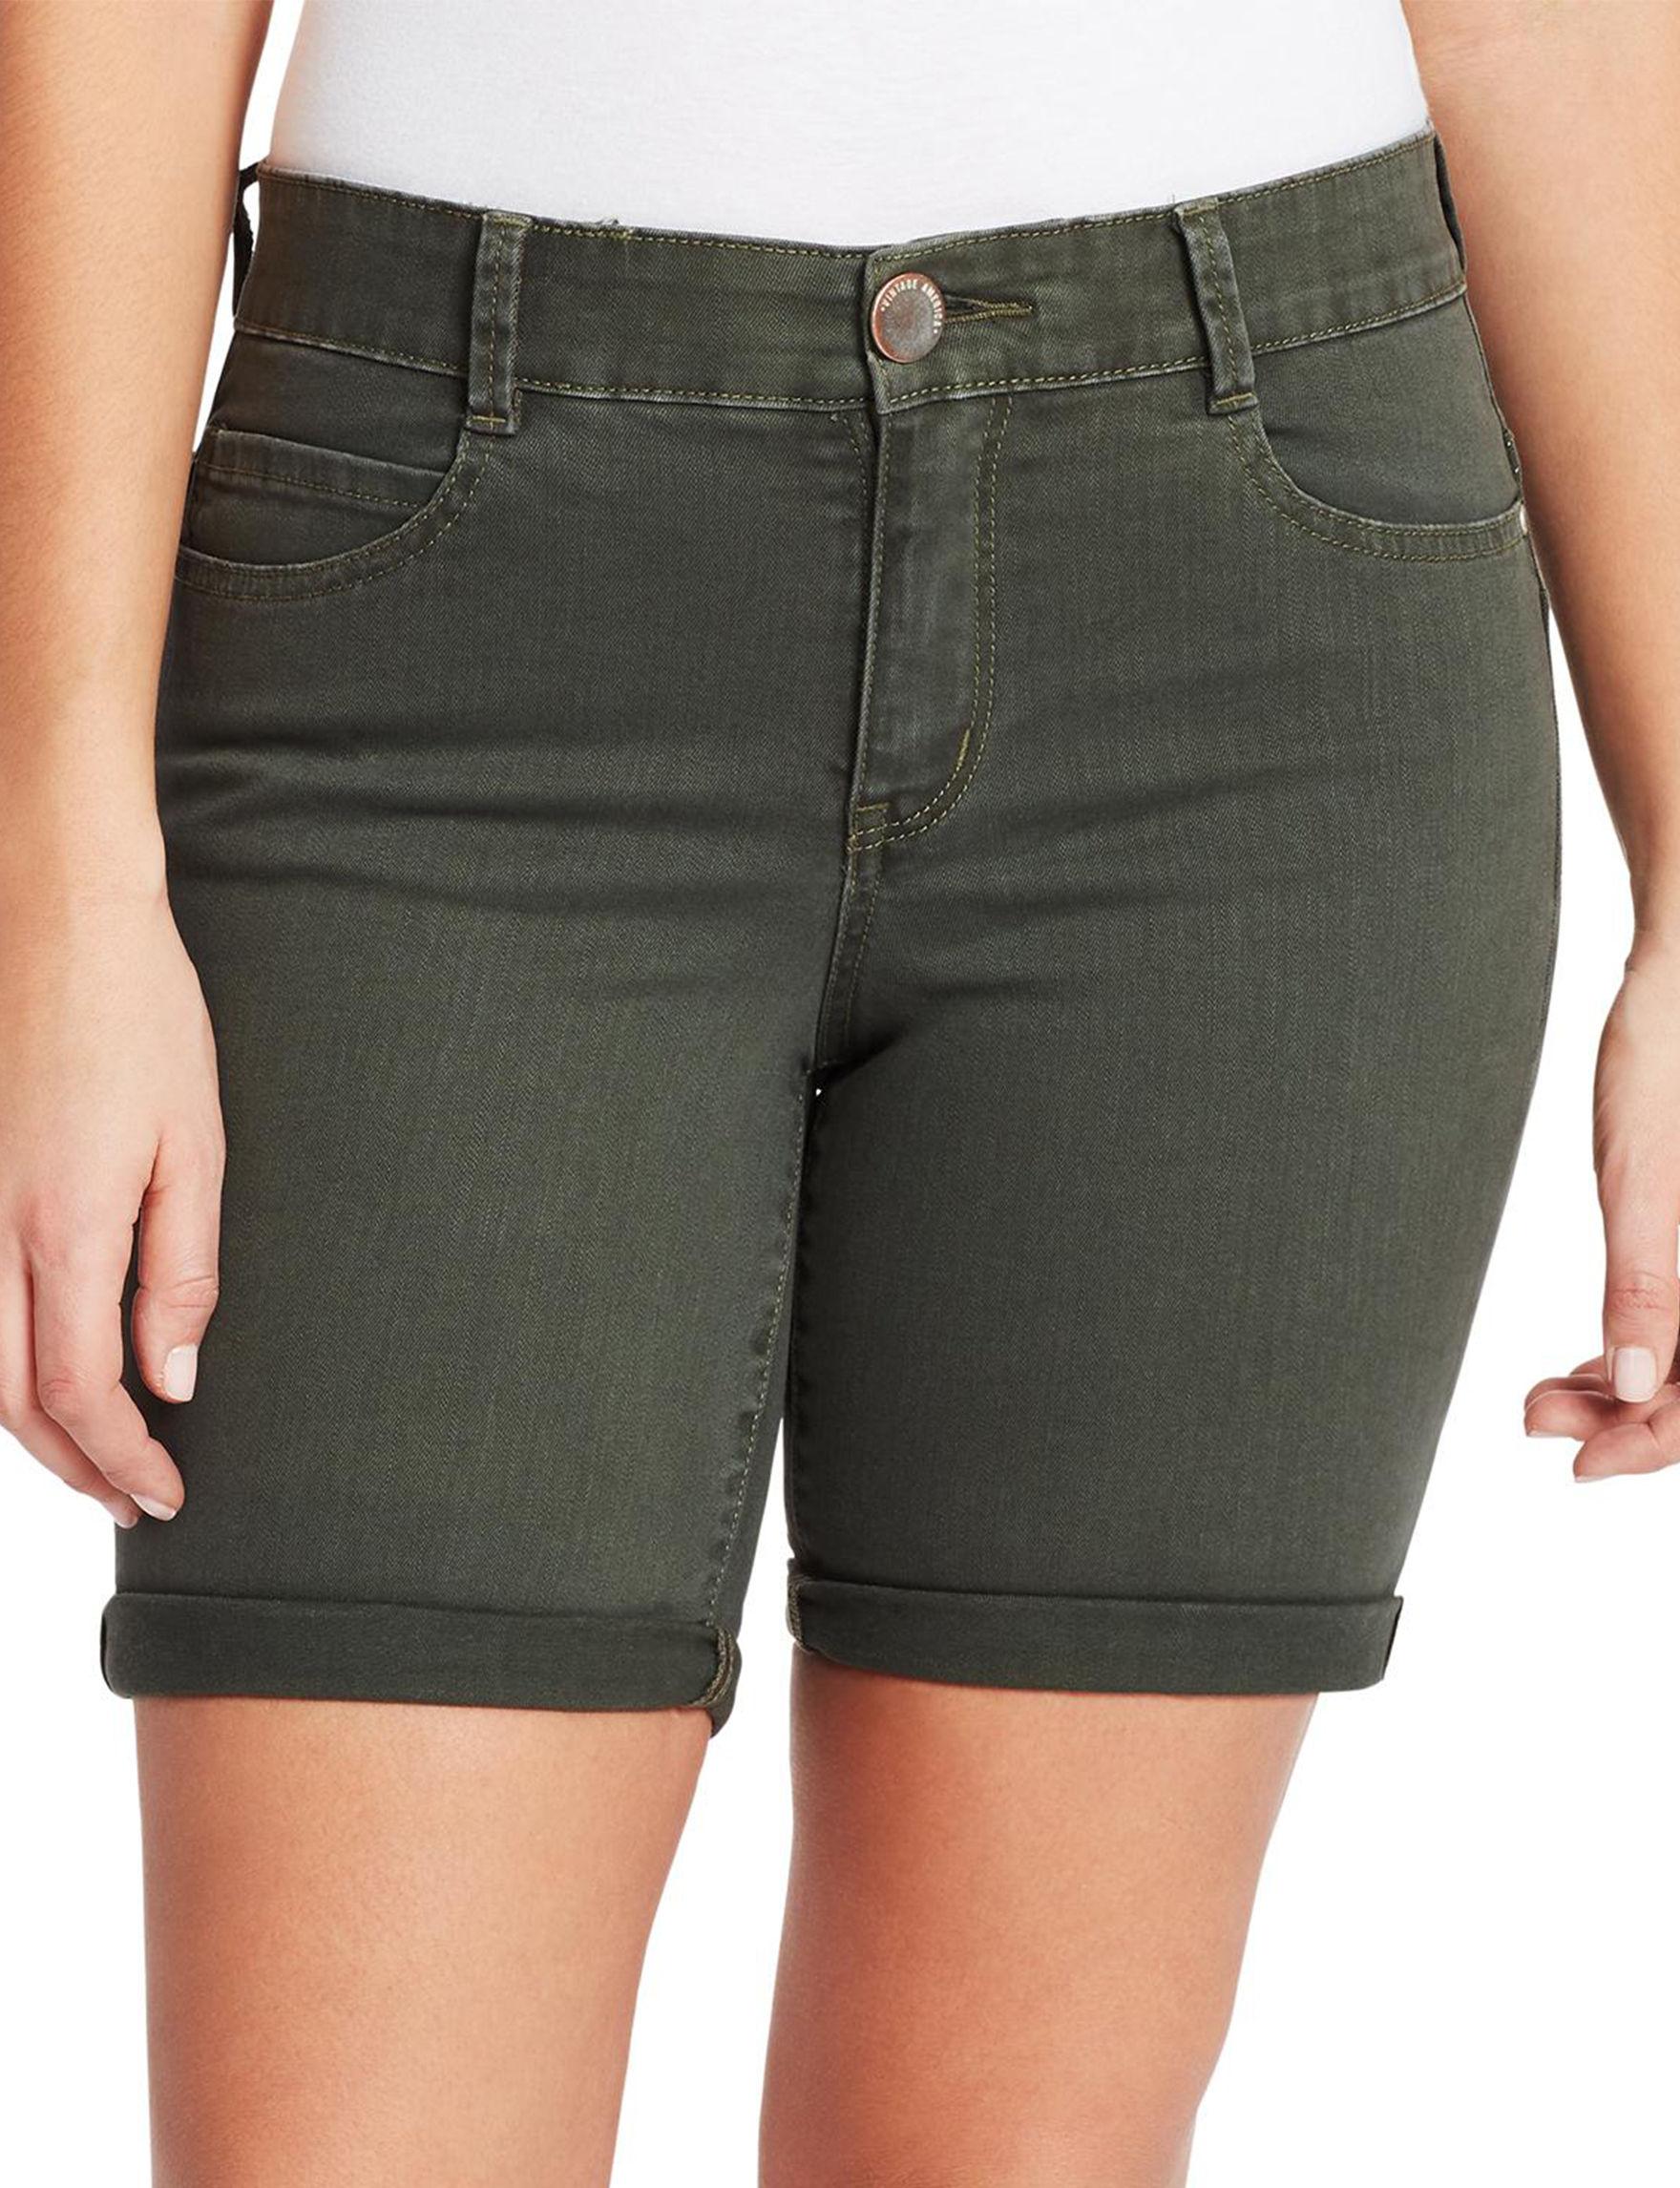 Vintage America Blues Black Denim Shorts